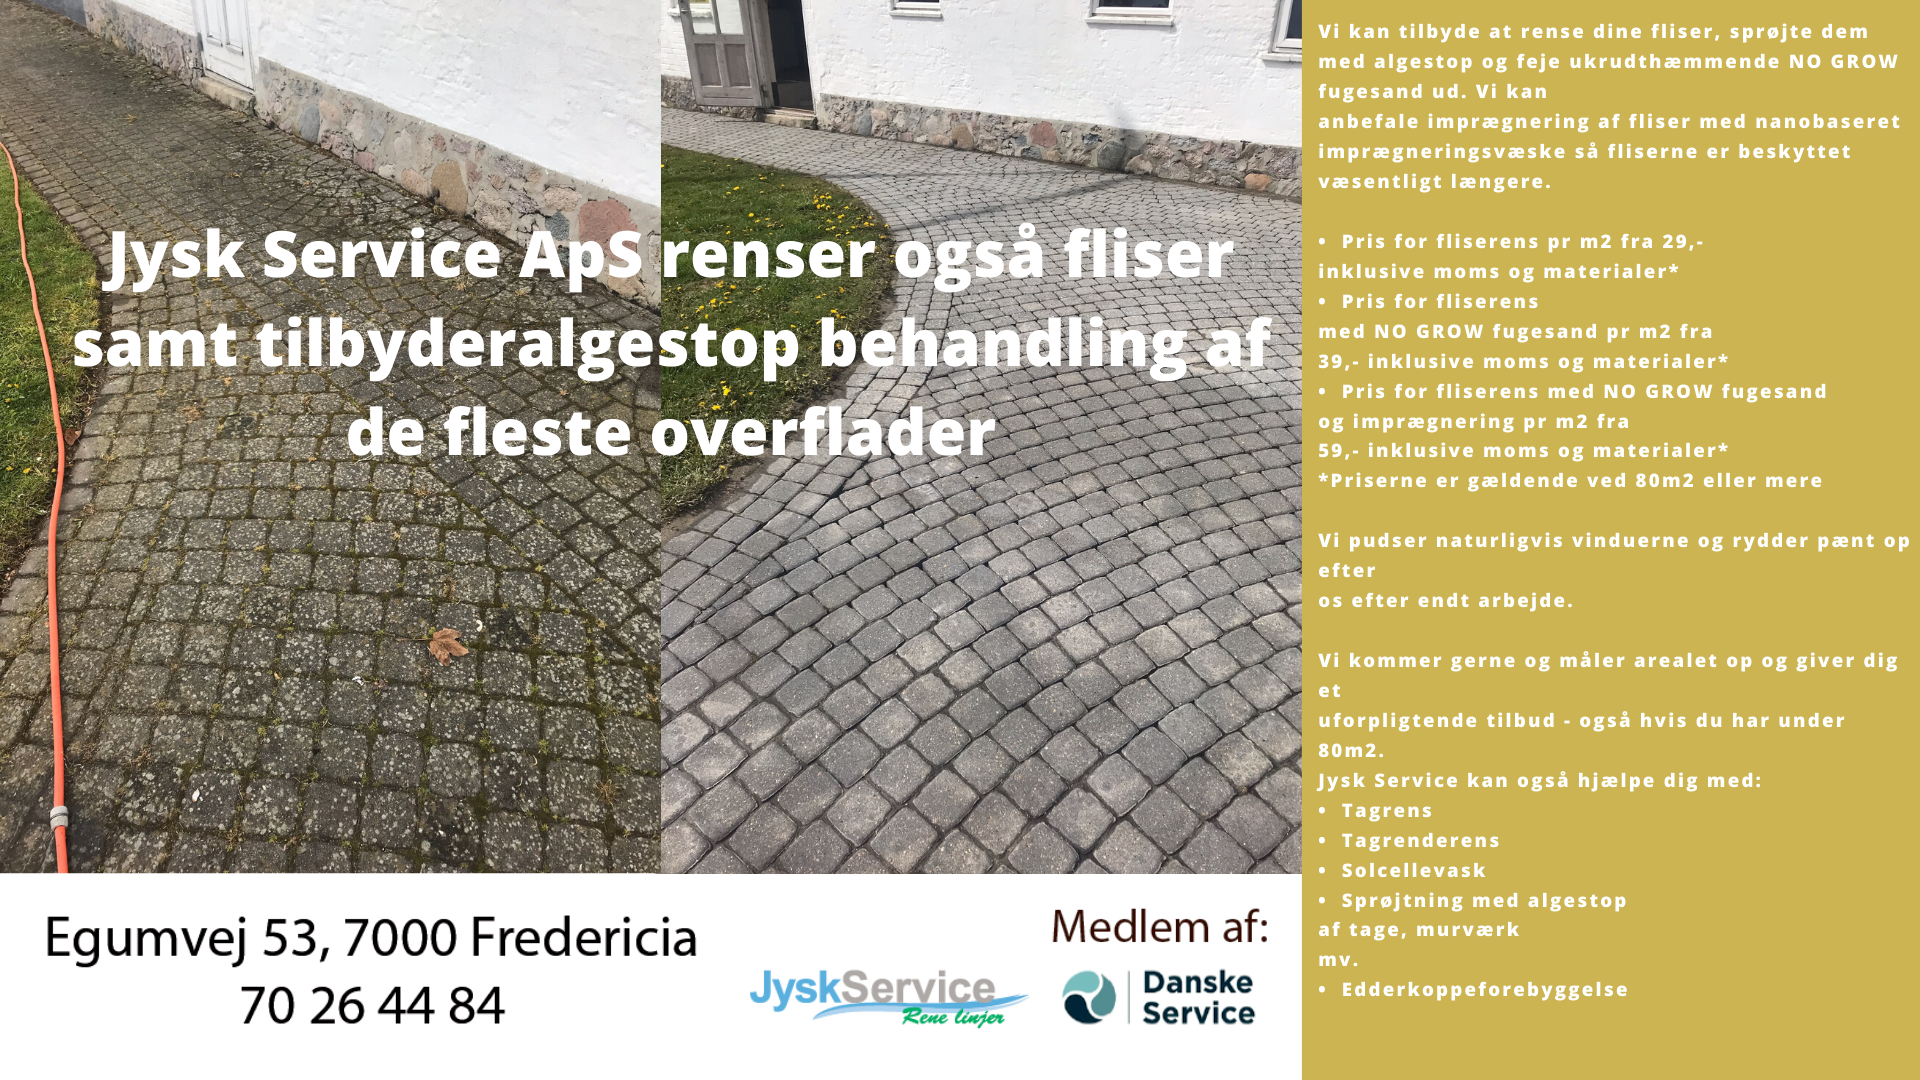 http://jyskserviceaps.dk/fliserens/